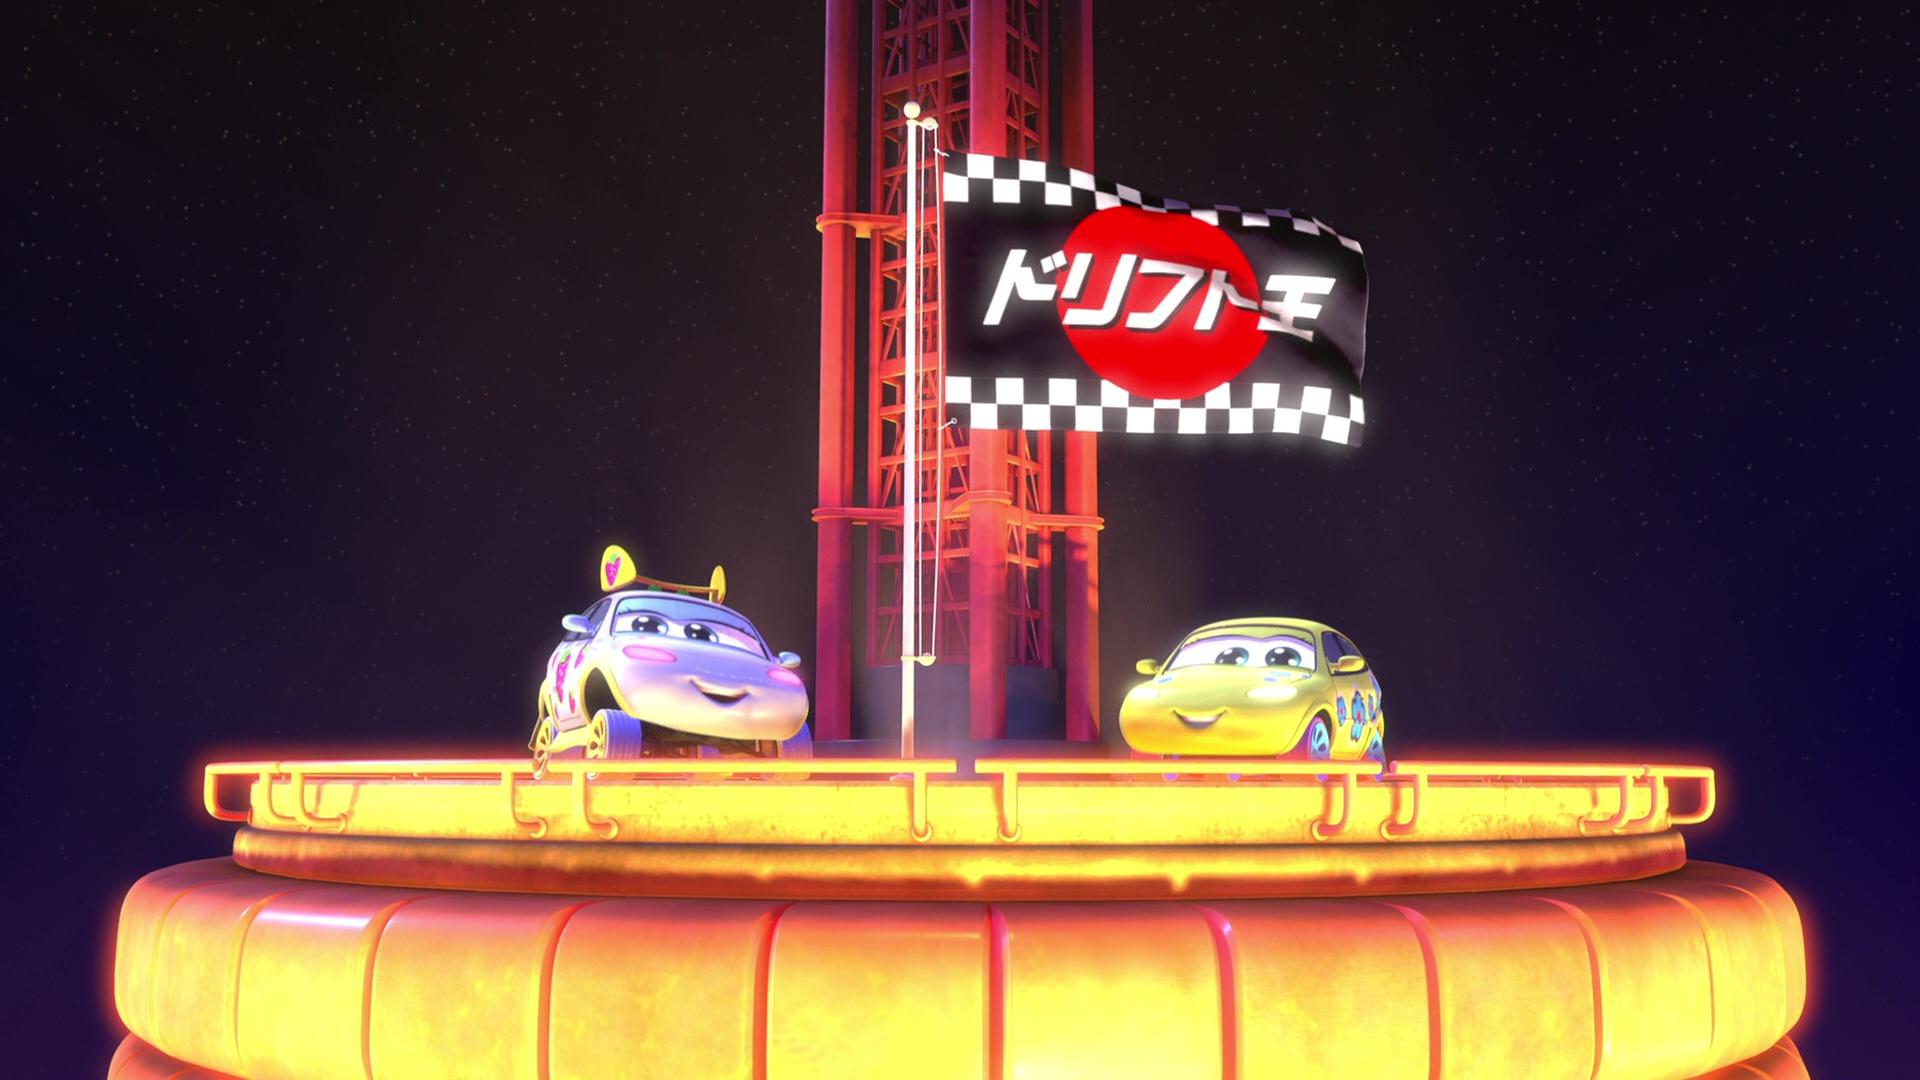 pixar disney personnage character cars toon martin tokyo mater ichigo